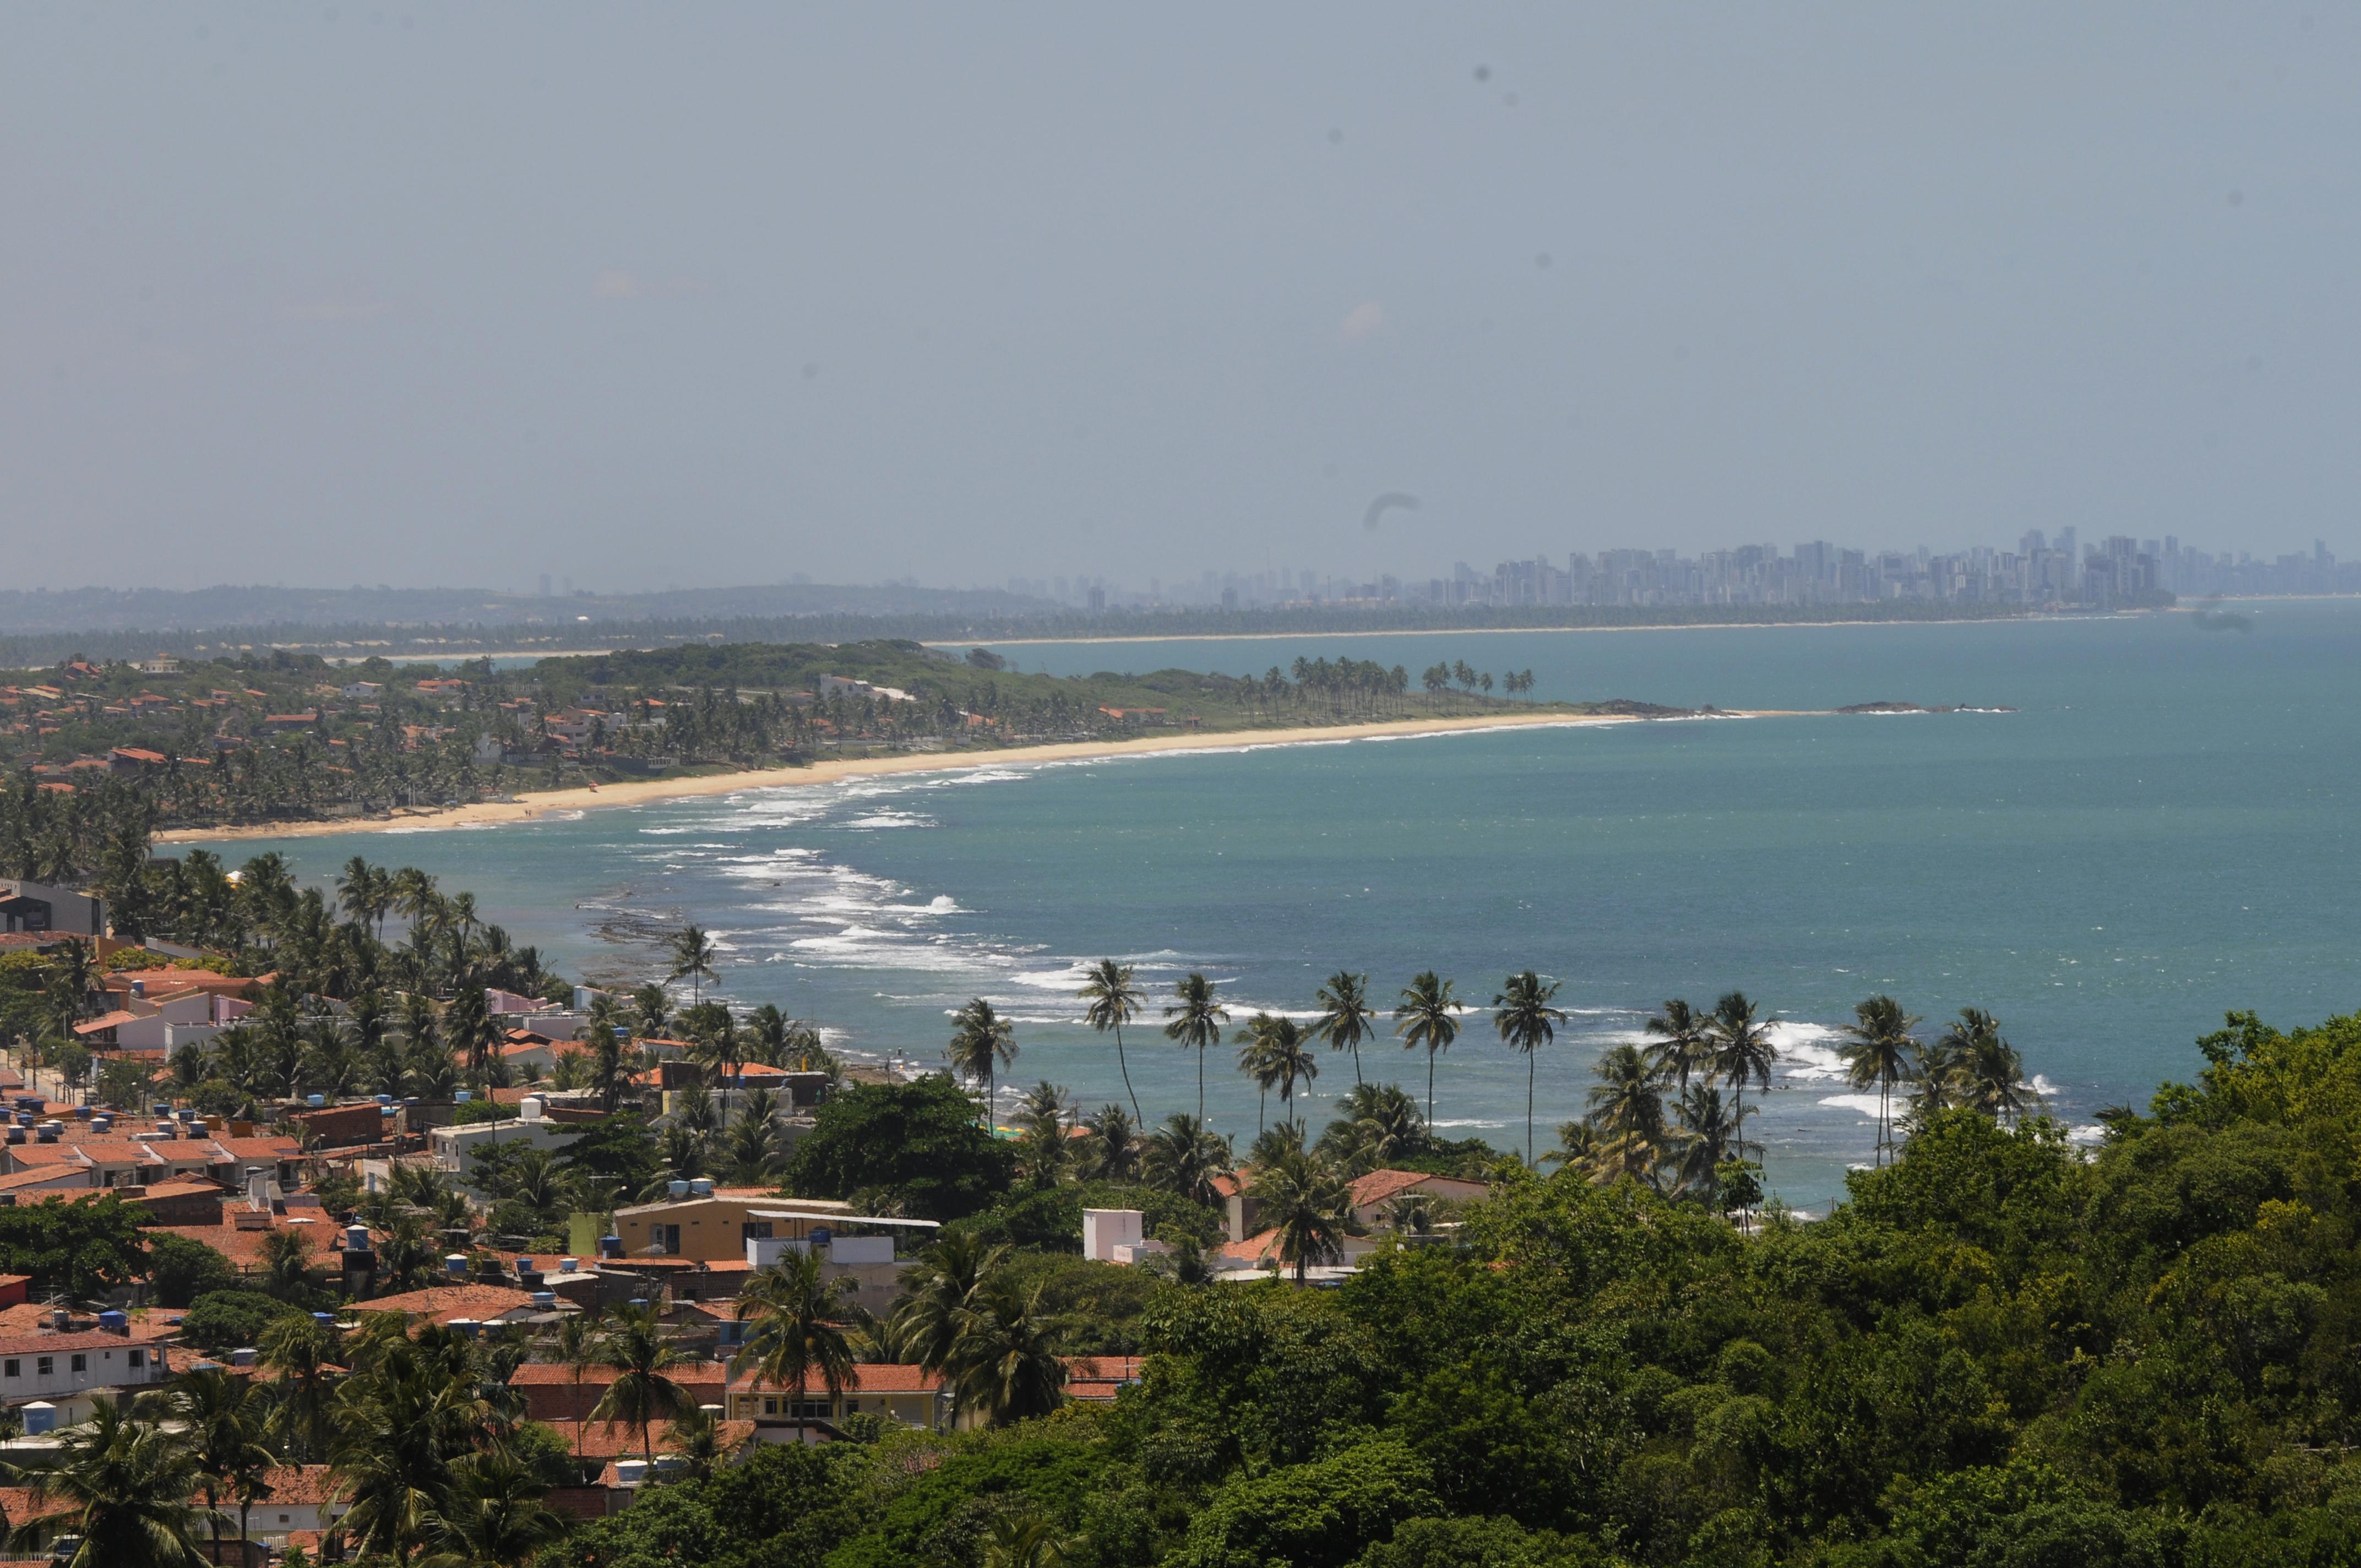 Vista da praia de Gaibú - Teresa Maia/DP/